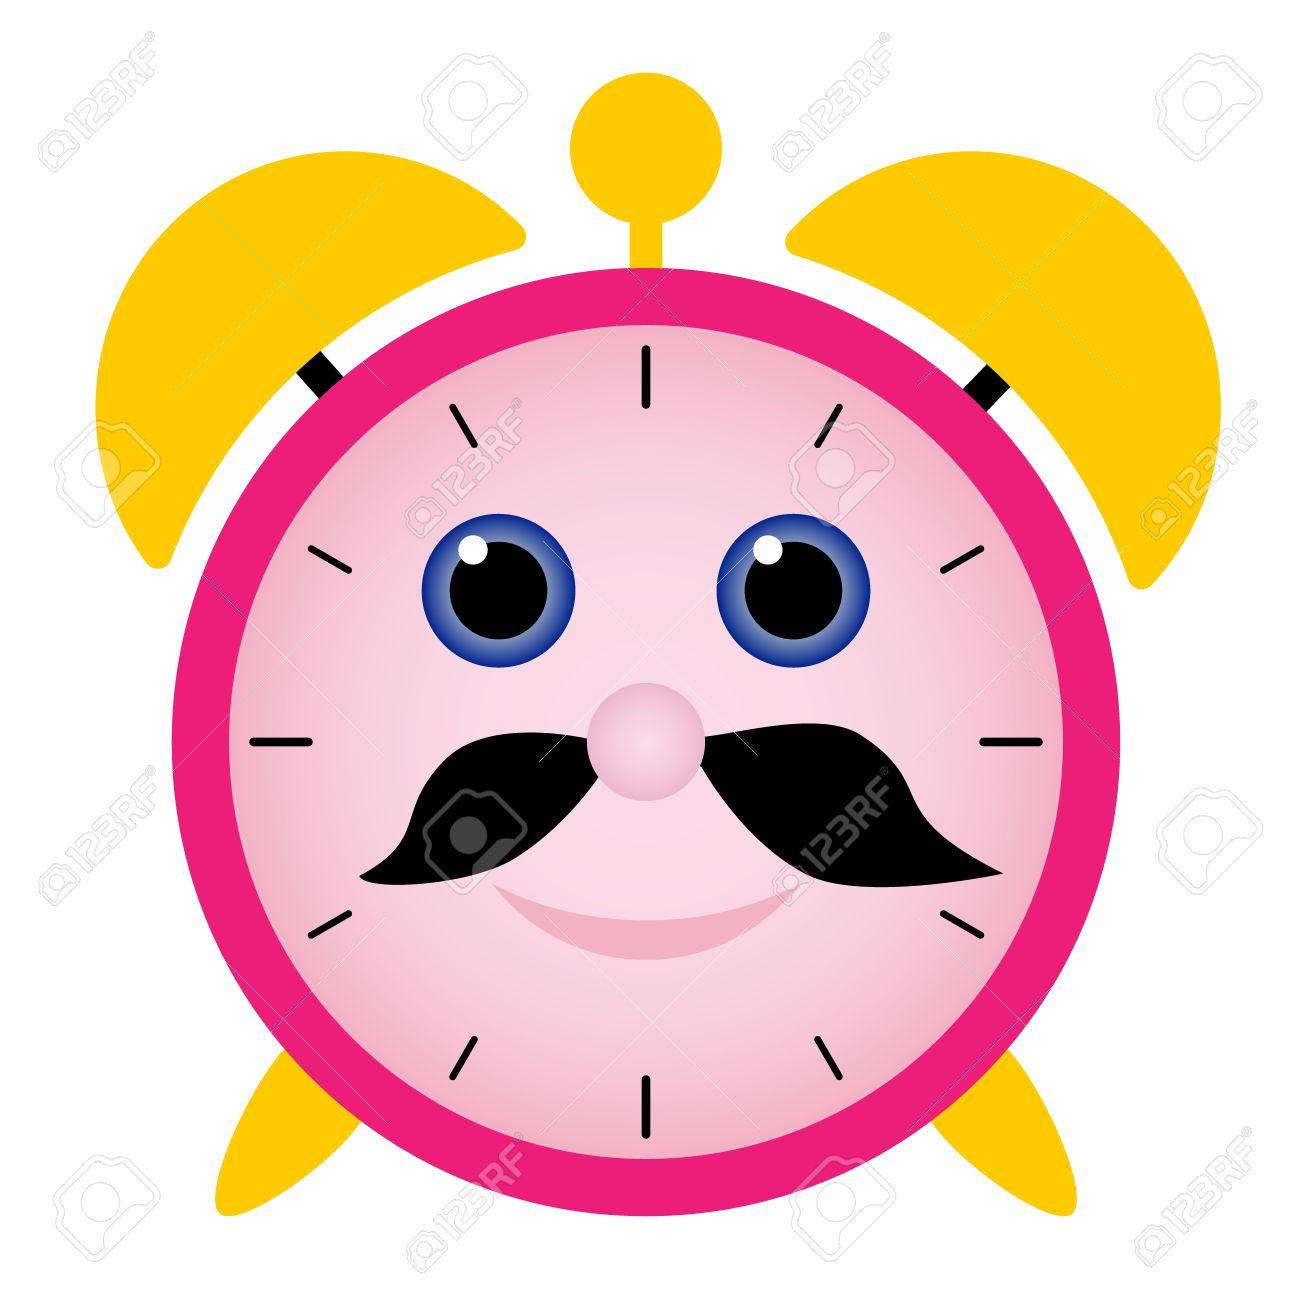 funny alarm clock with happy face black beard and blue eyes royalty rh 123rf com